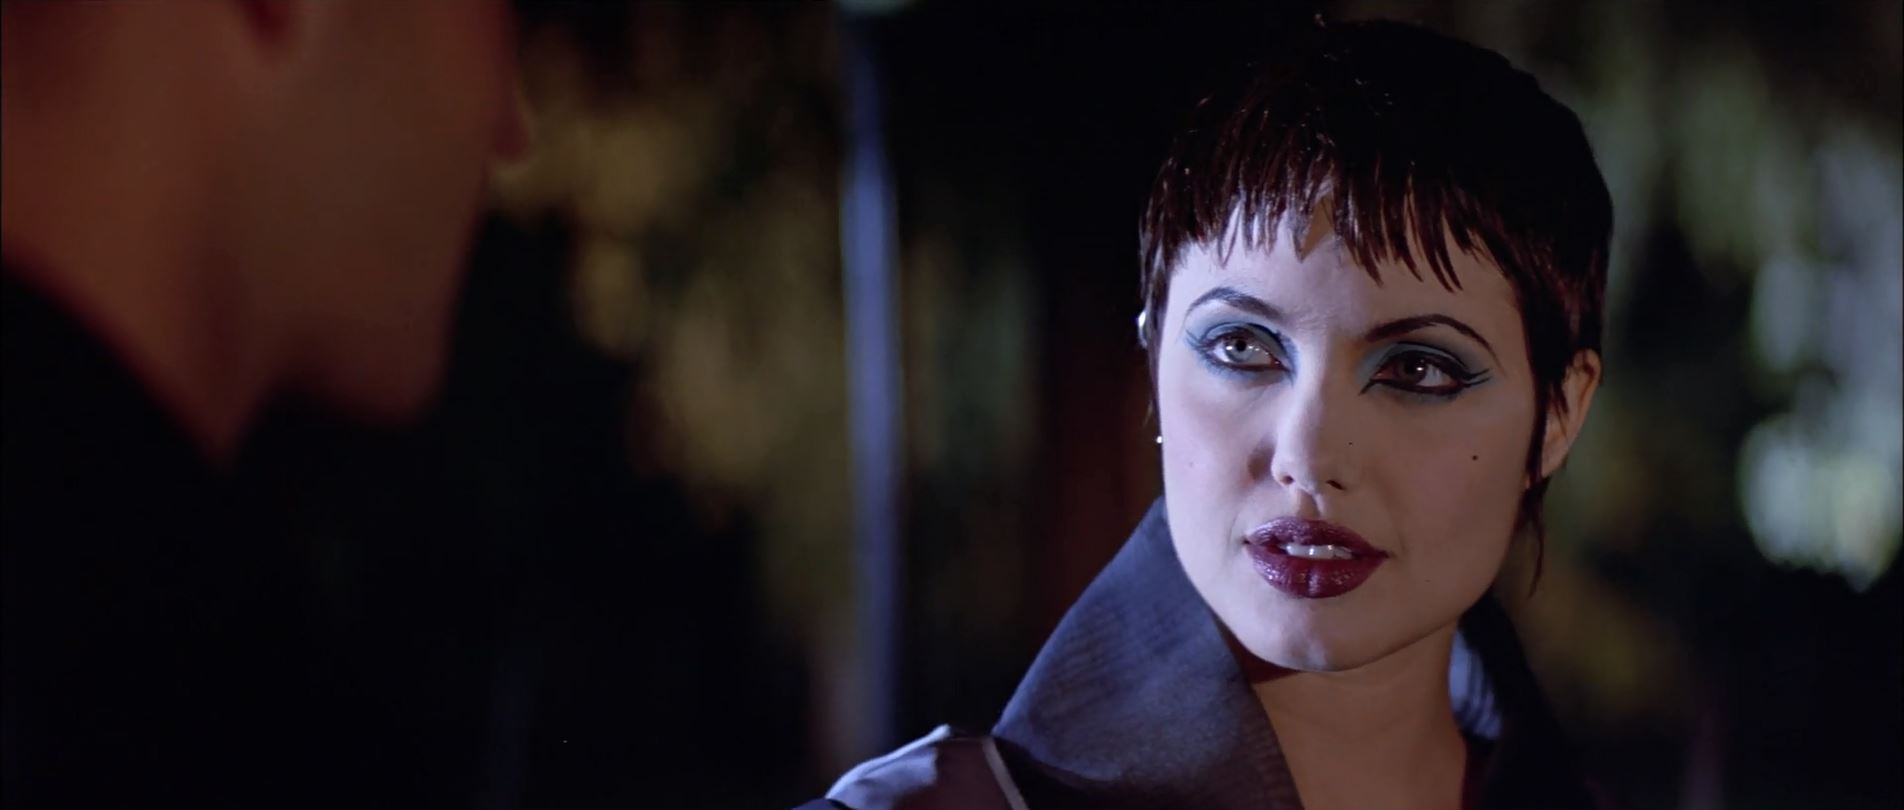 Angelina Jolie as Kate Libby - Acid Burns